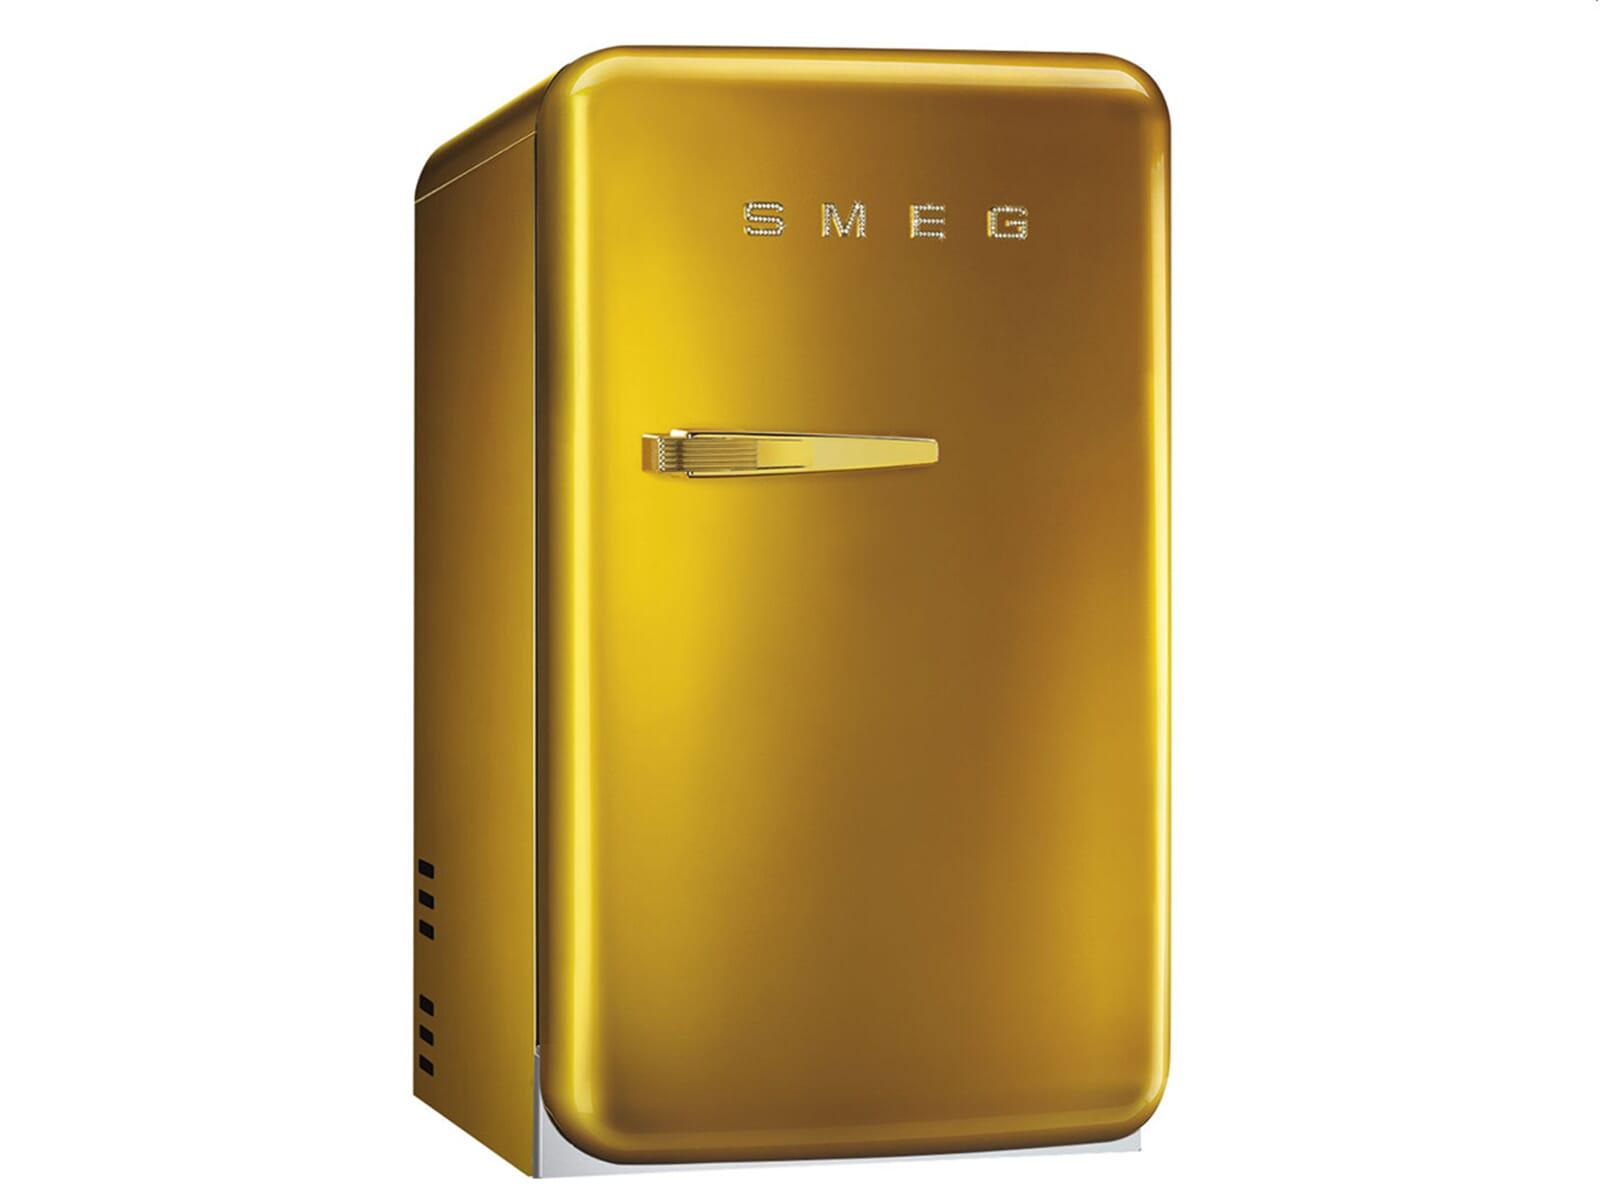 Smeg Kühlschrank Günstig : Smeg küchengeräte im retro design kühlschränke und co